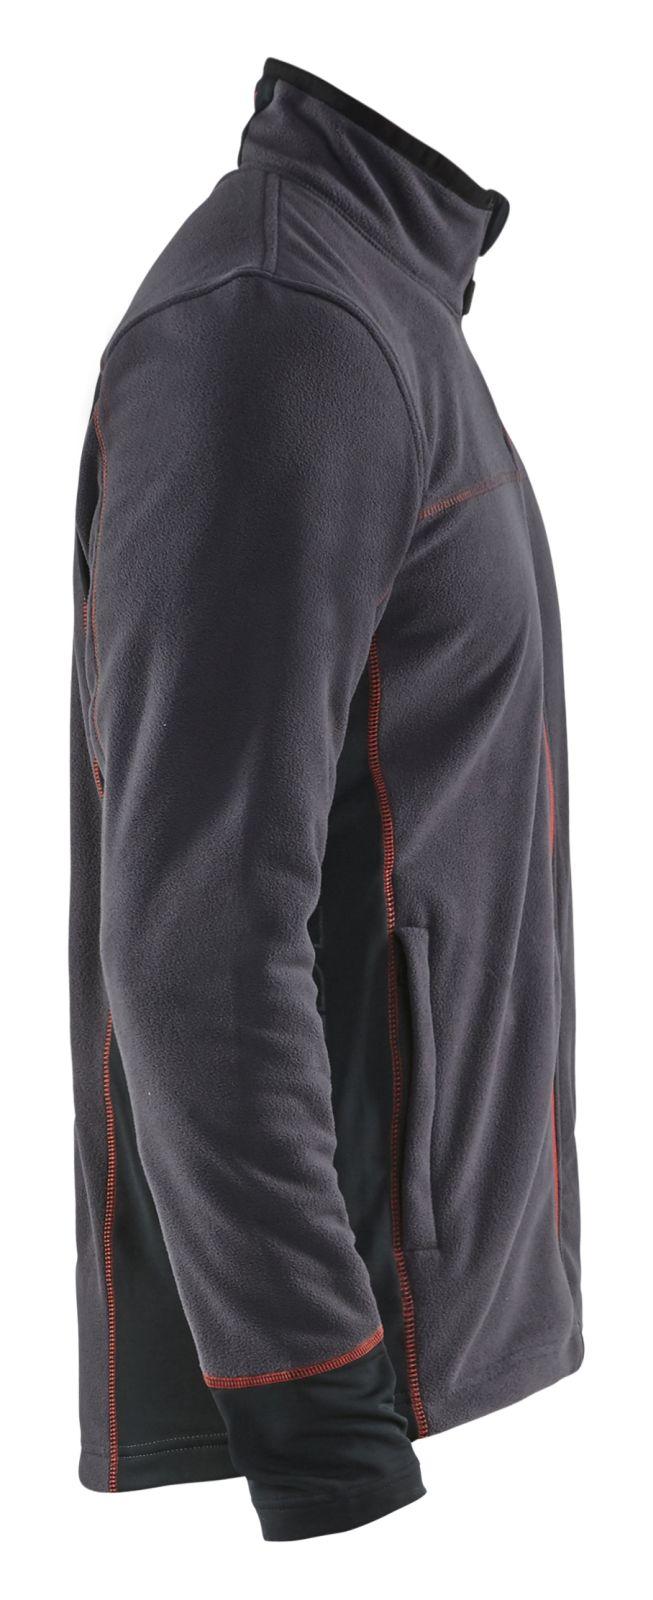 Blaklader Fleece vesten 49951010 donkergrijs-rood(9756)